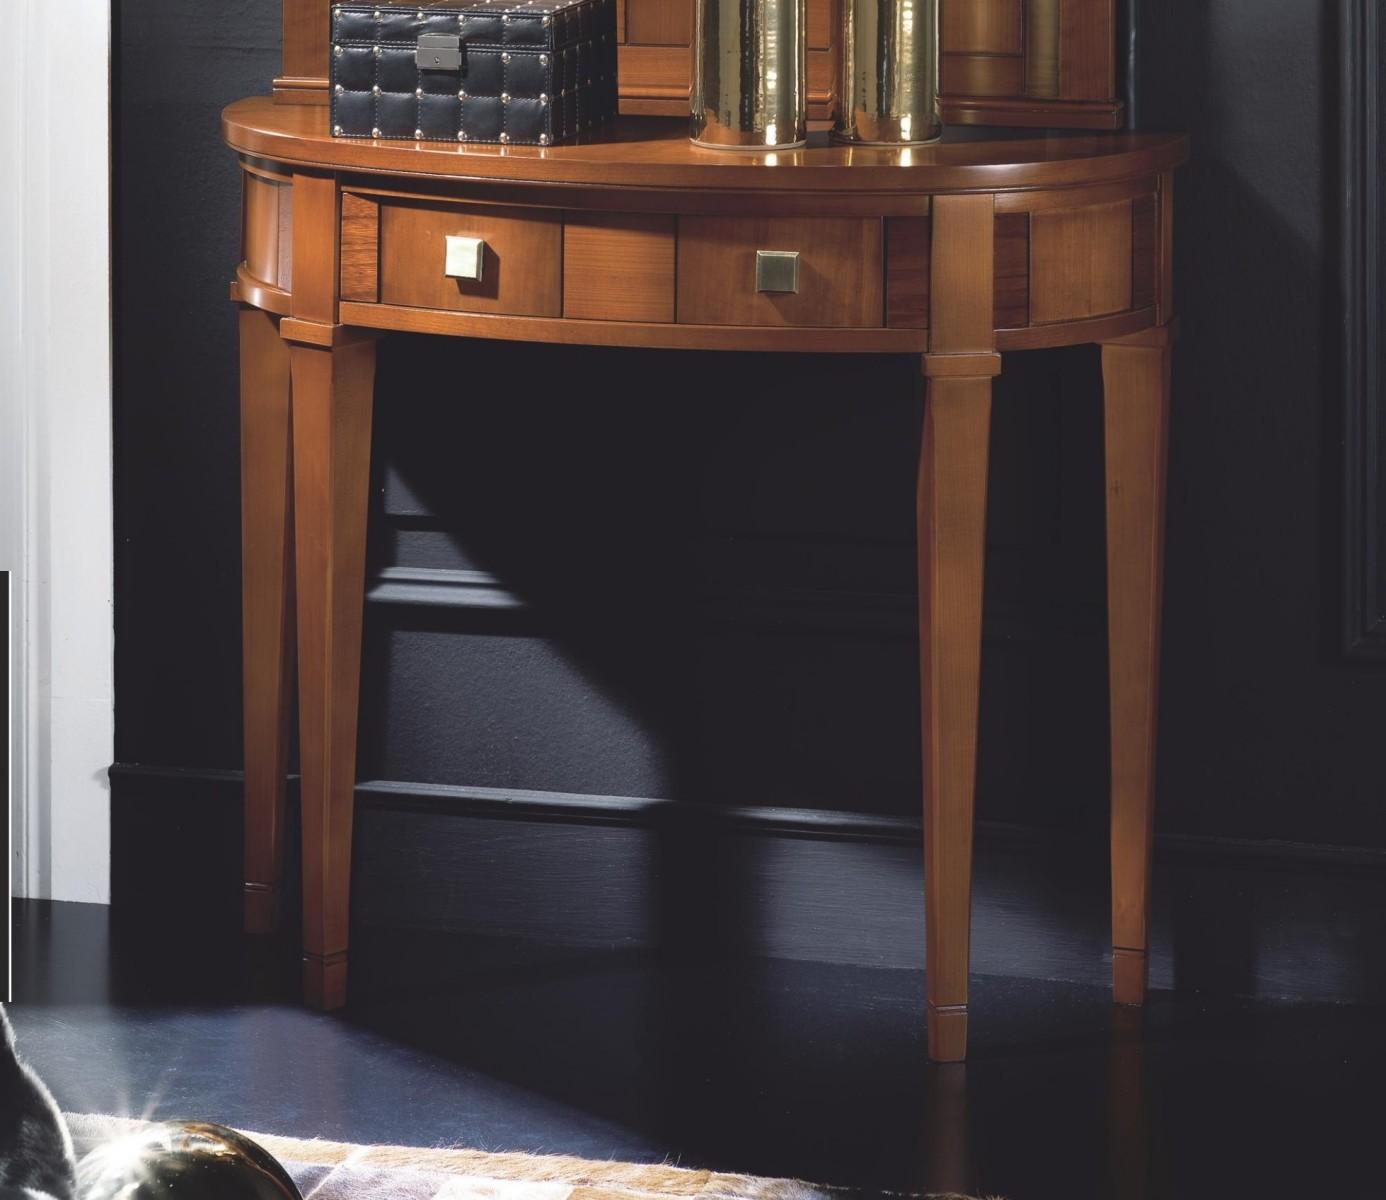 Recibidor cl sico colonial madera dise o 667 503 mobles for Mueble recibidor diseno